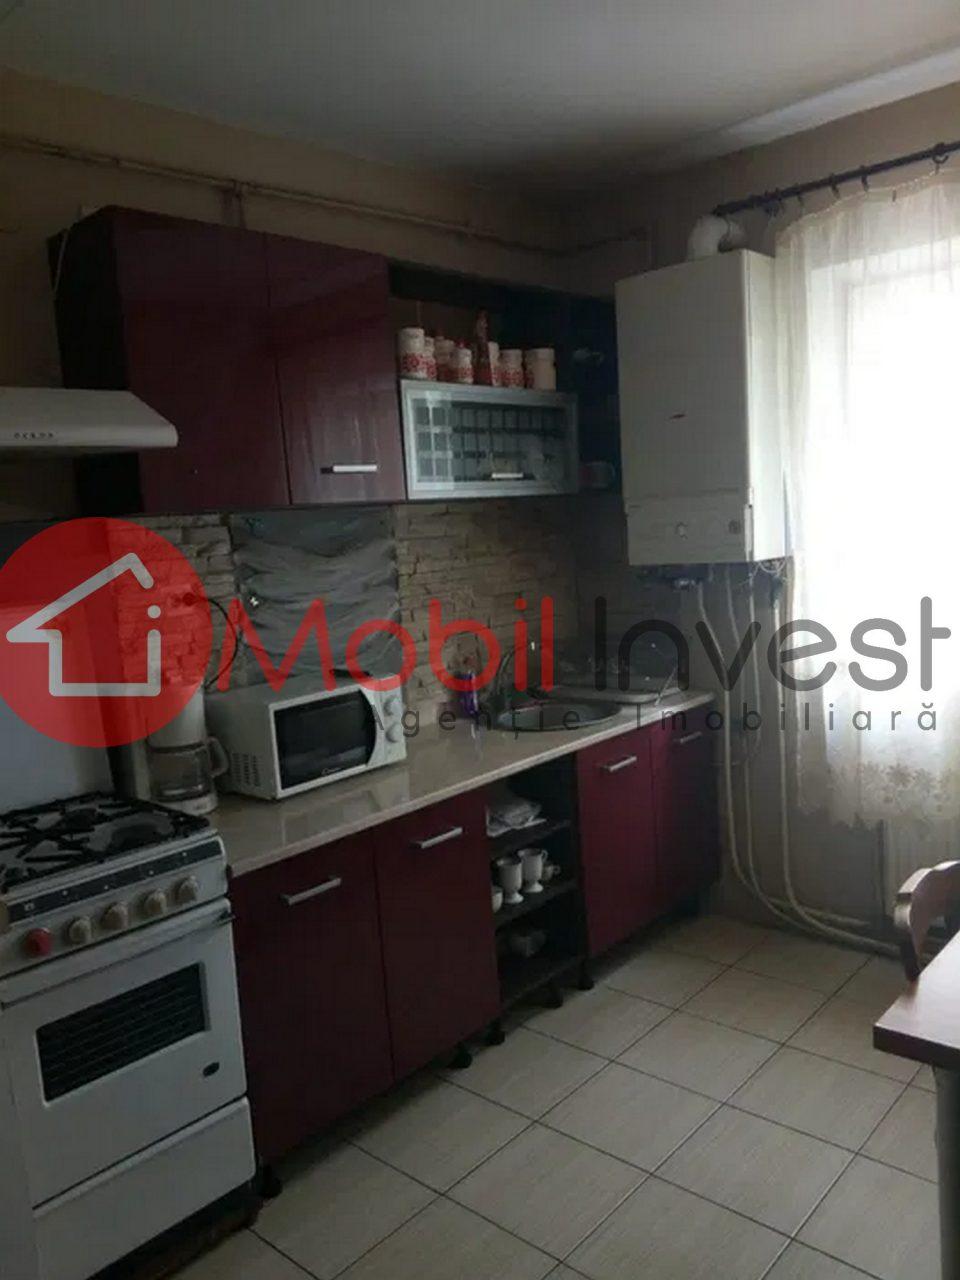 Apartament 2 camere, 56 mp, zona Cetate